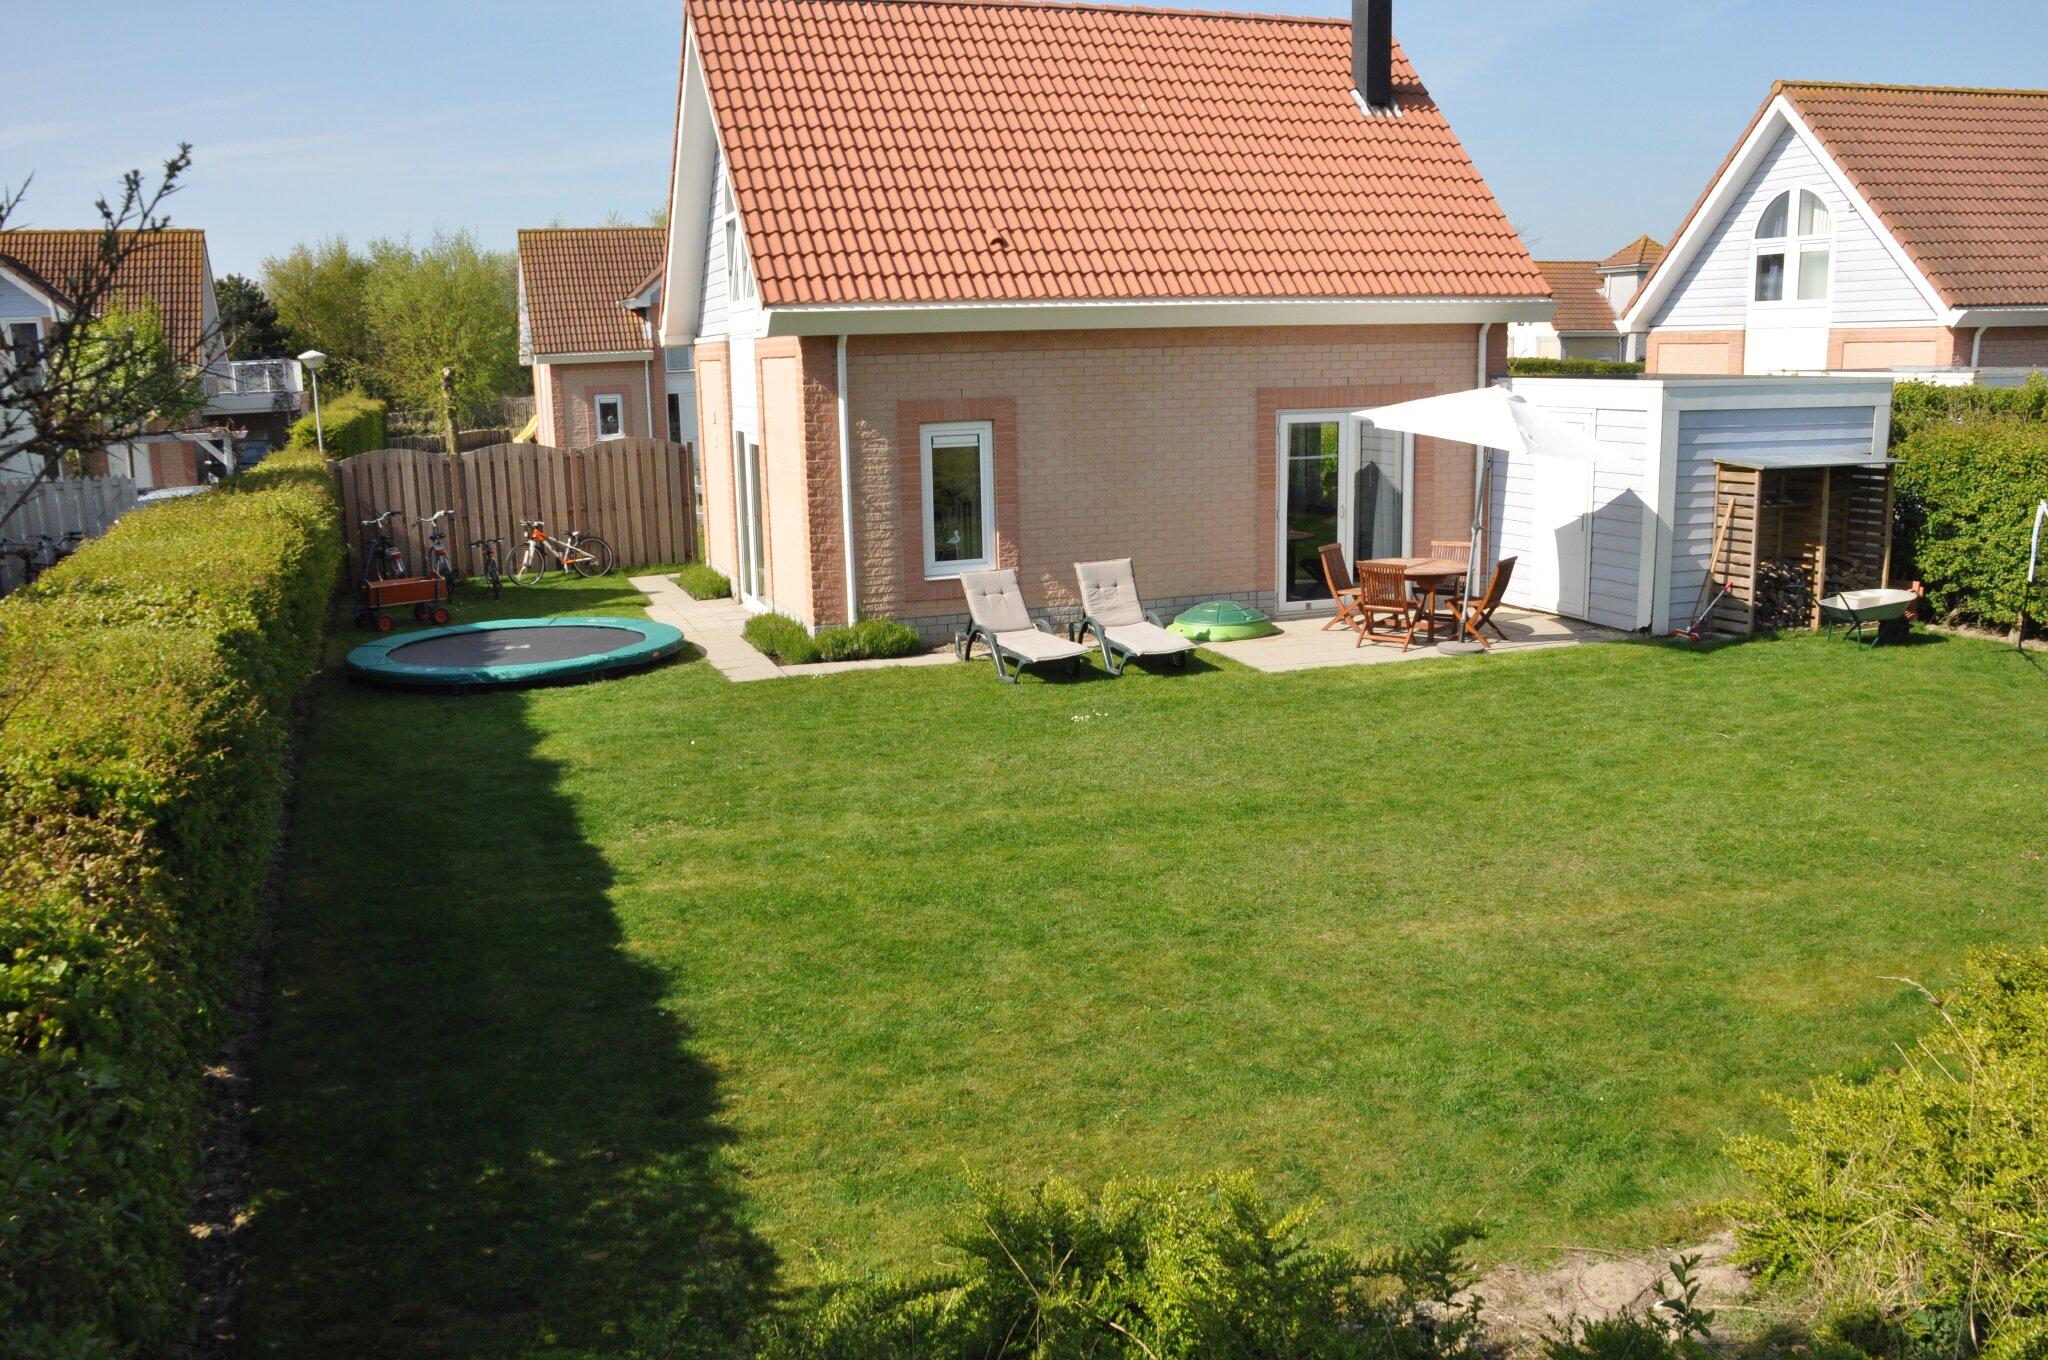 Großer Garten, Spielwiese, Sonnenliegen